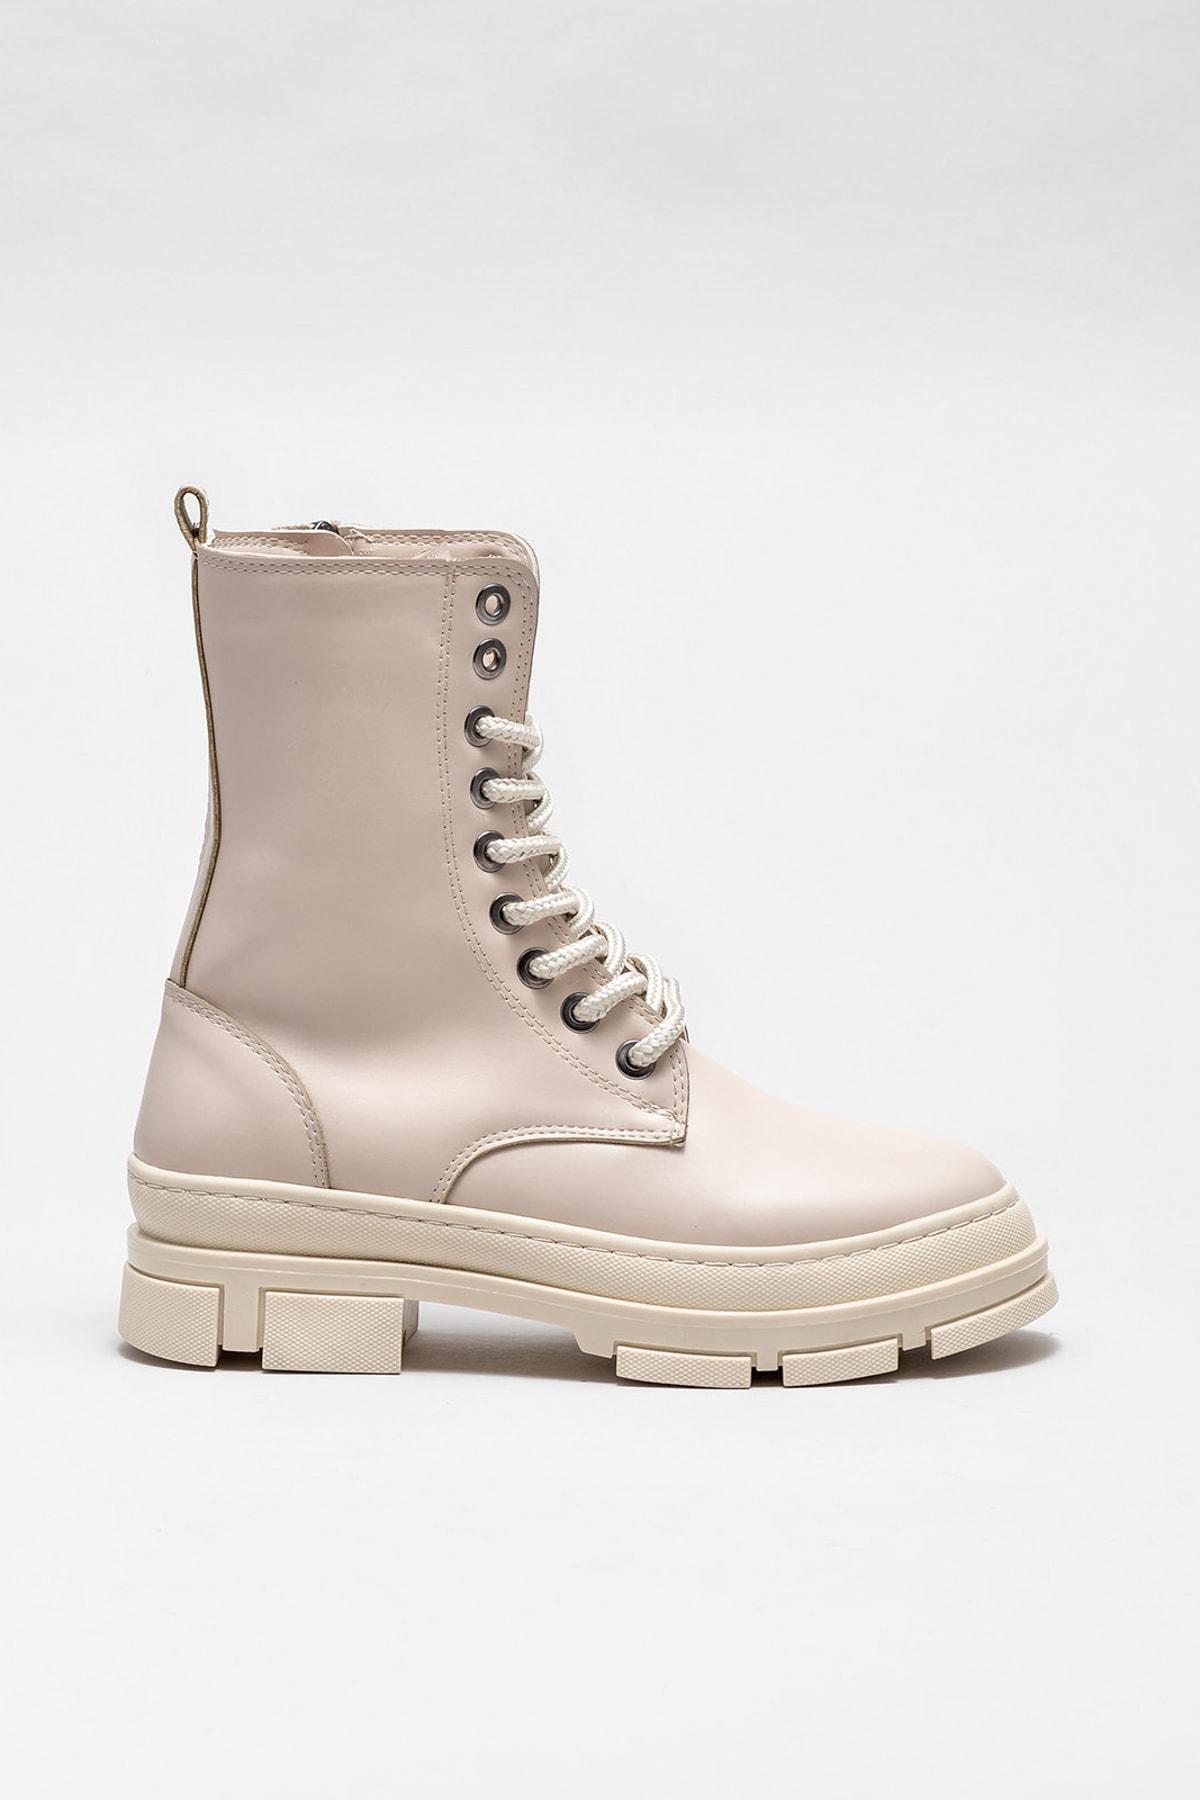 Elle Shoes Kadın Pompey Bej Bot & Bootie 20KAD3434-04 1